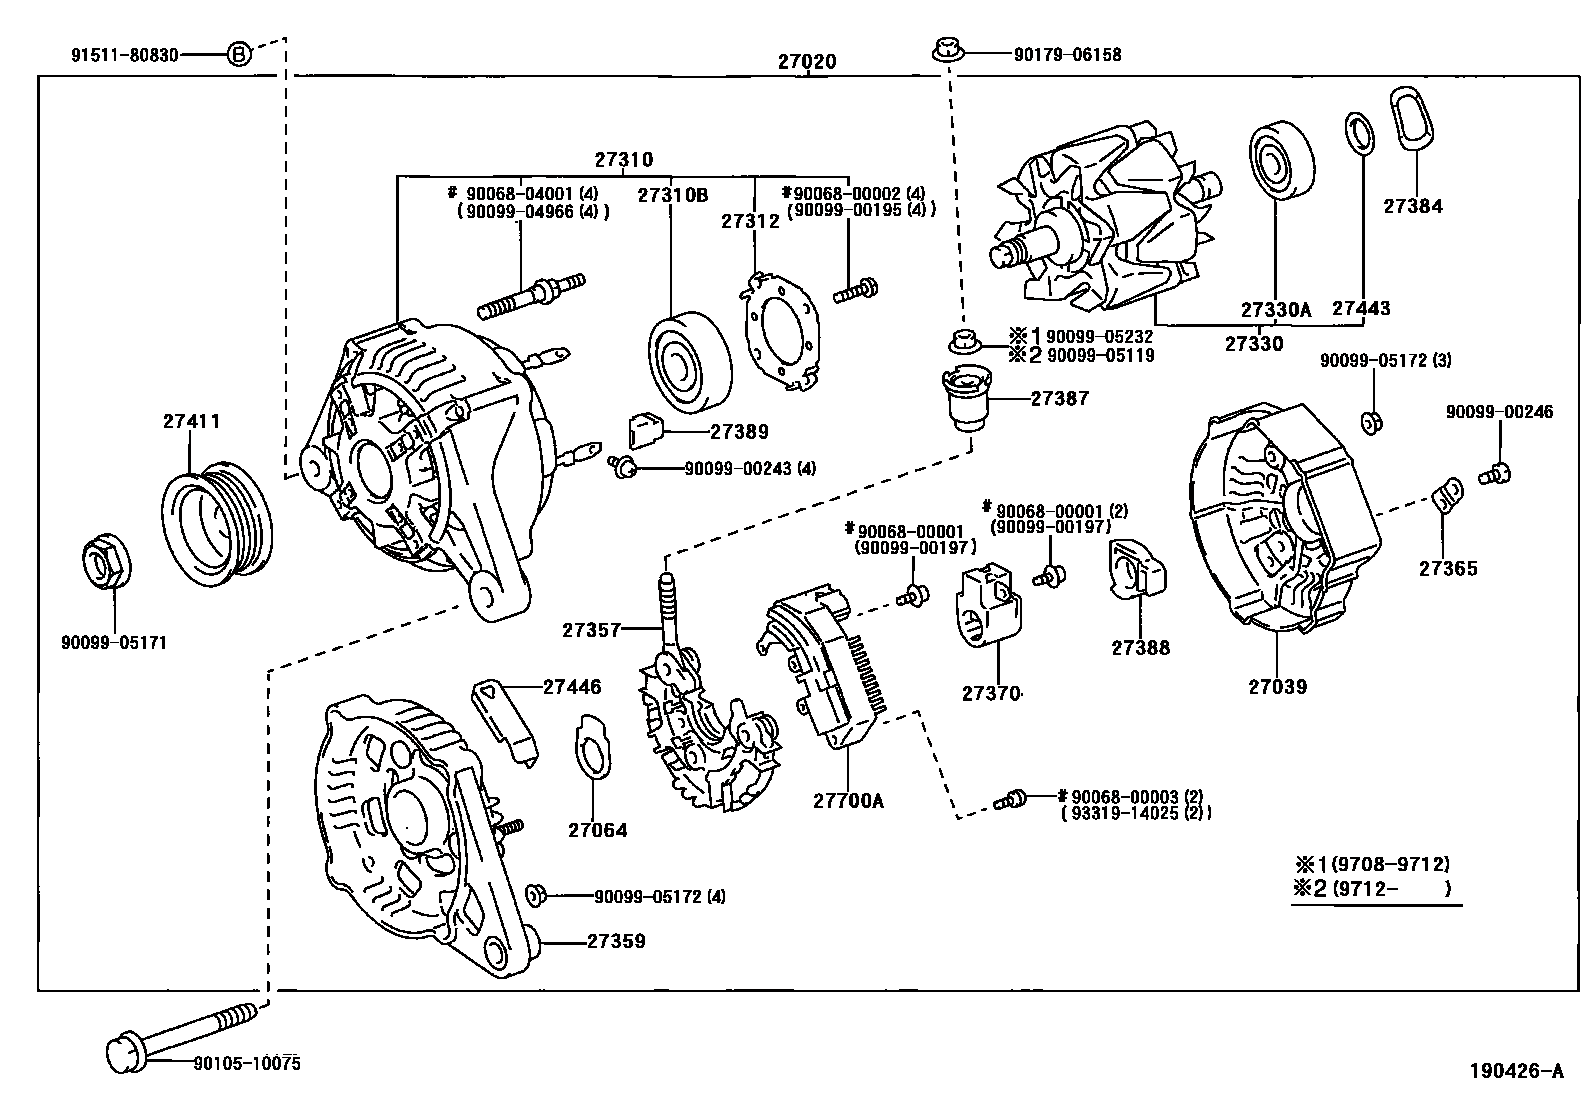 medium resolution of diy 1999 toyota corolla ve 1zzfe engine alternator exploded diagram 2003 ford f 250 engine diagram toyota corolla 2010 engine diagram